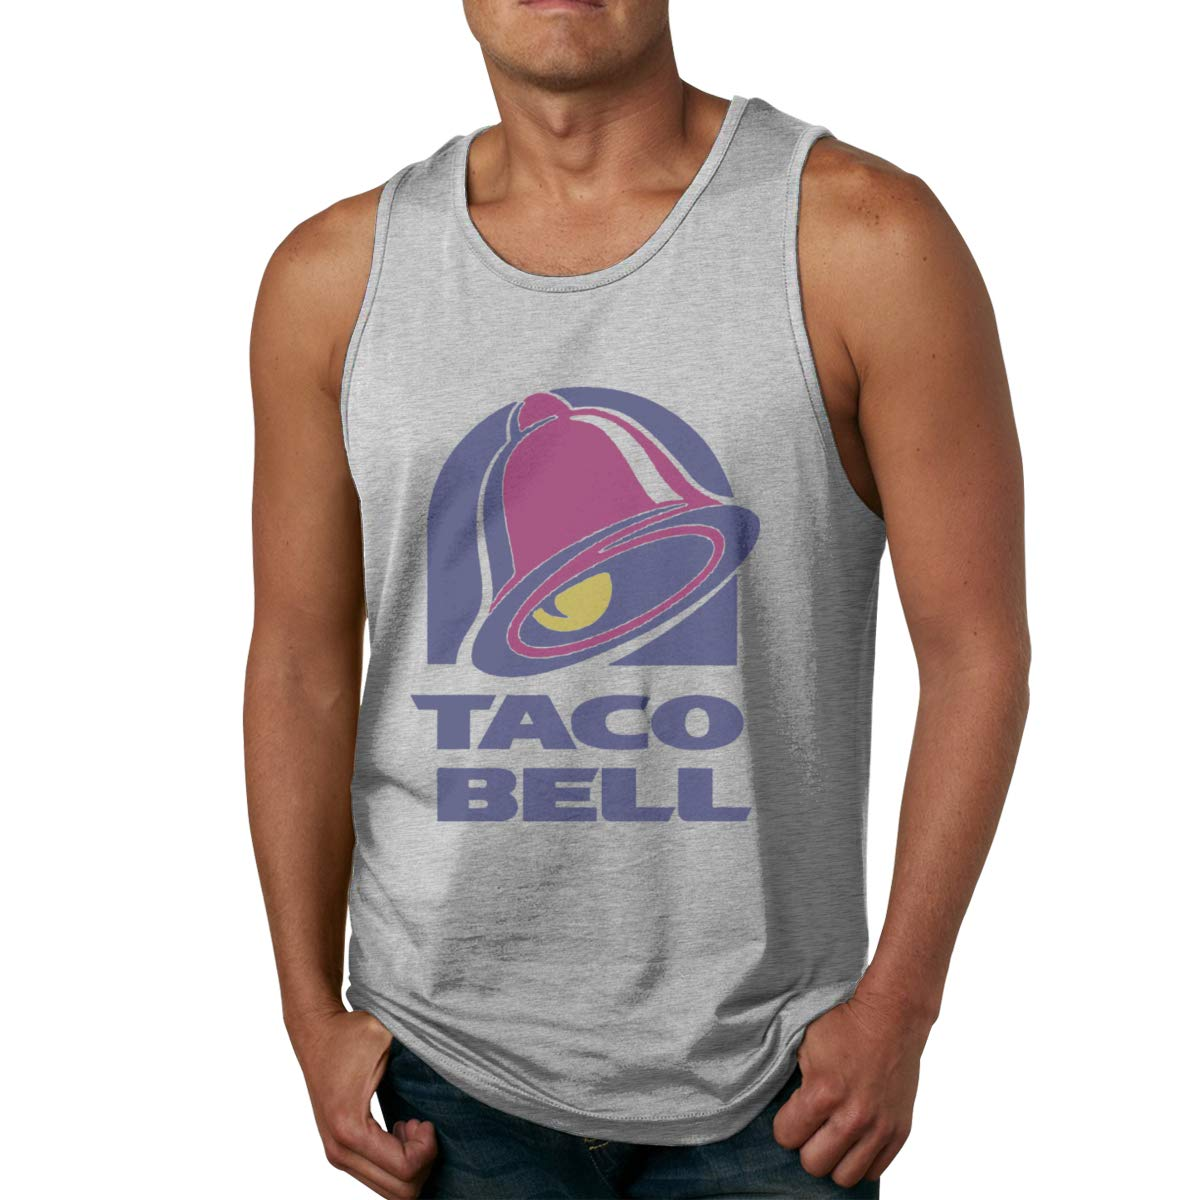 Viihahn S Design Illuminati Triangle Art Bell With Taco Quality Casual Travel Shirts